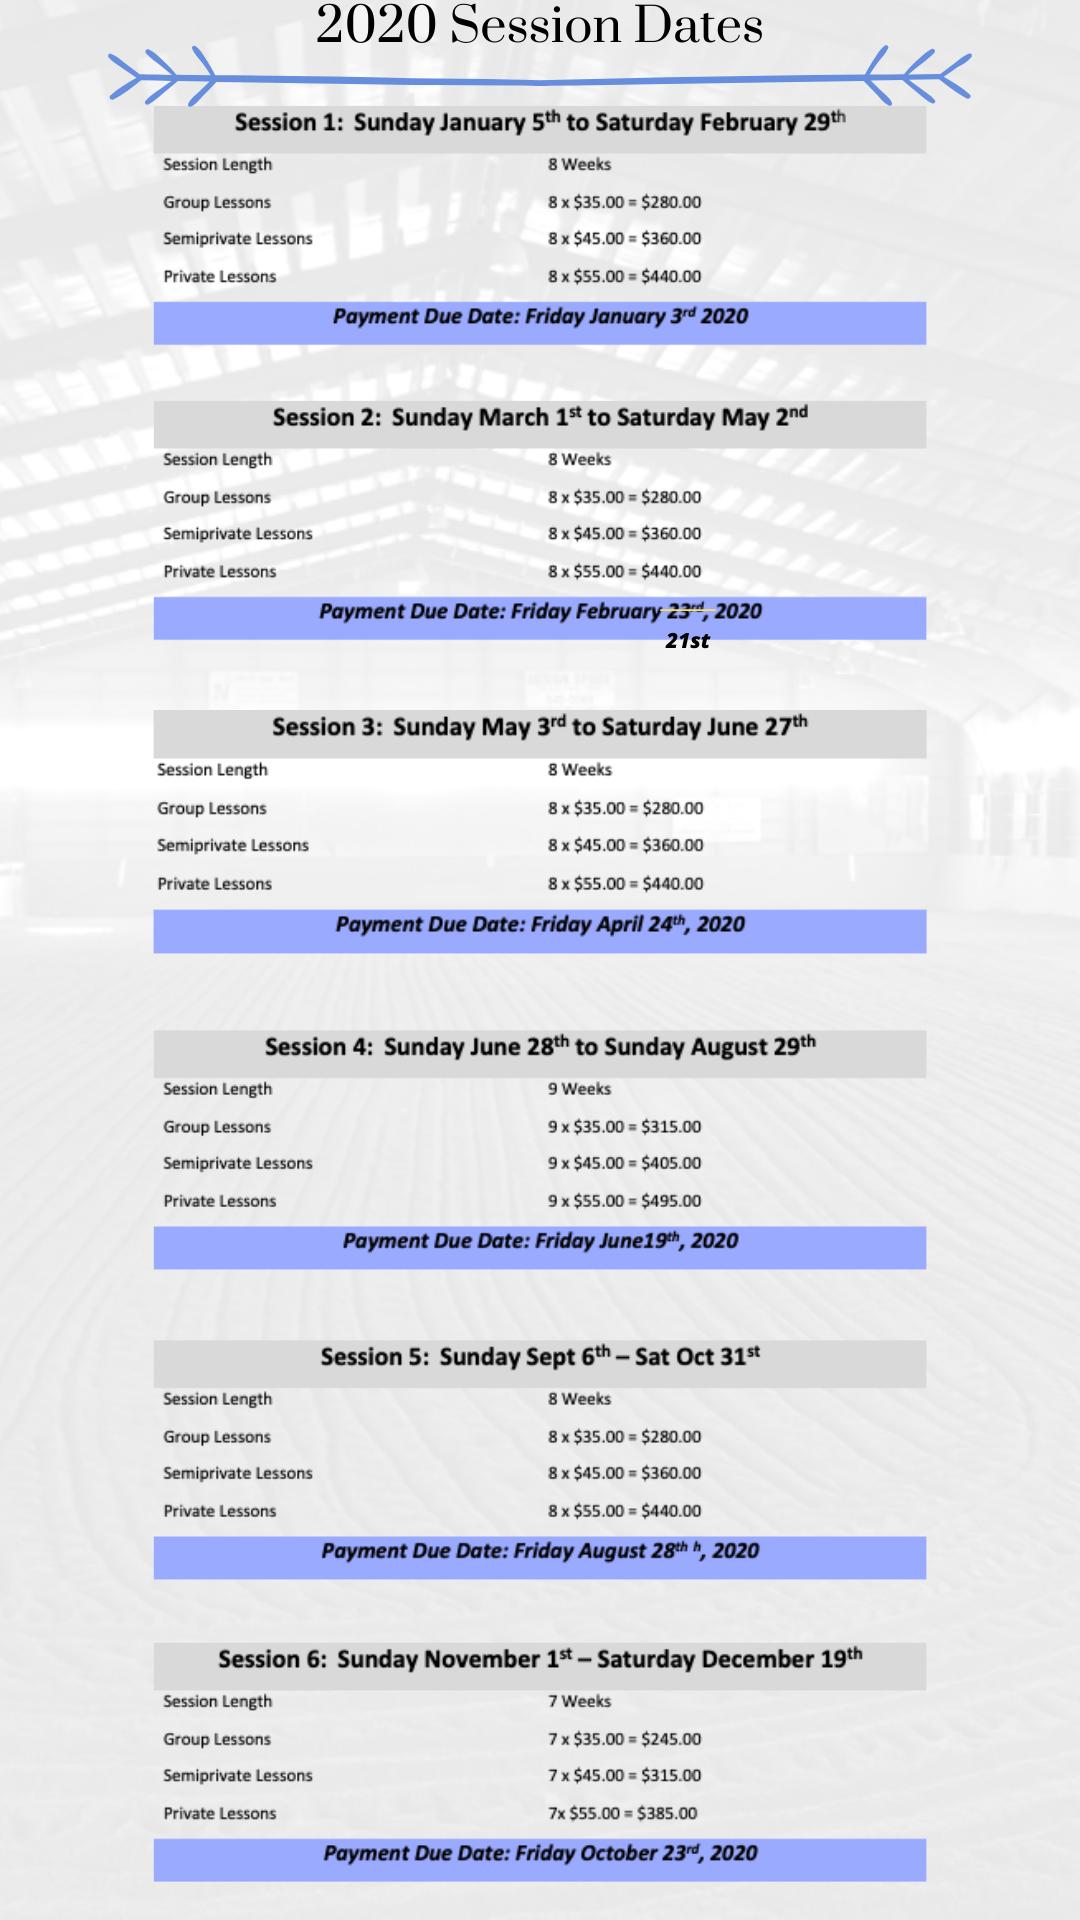 2020 Session Dates (3)